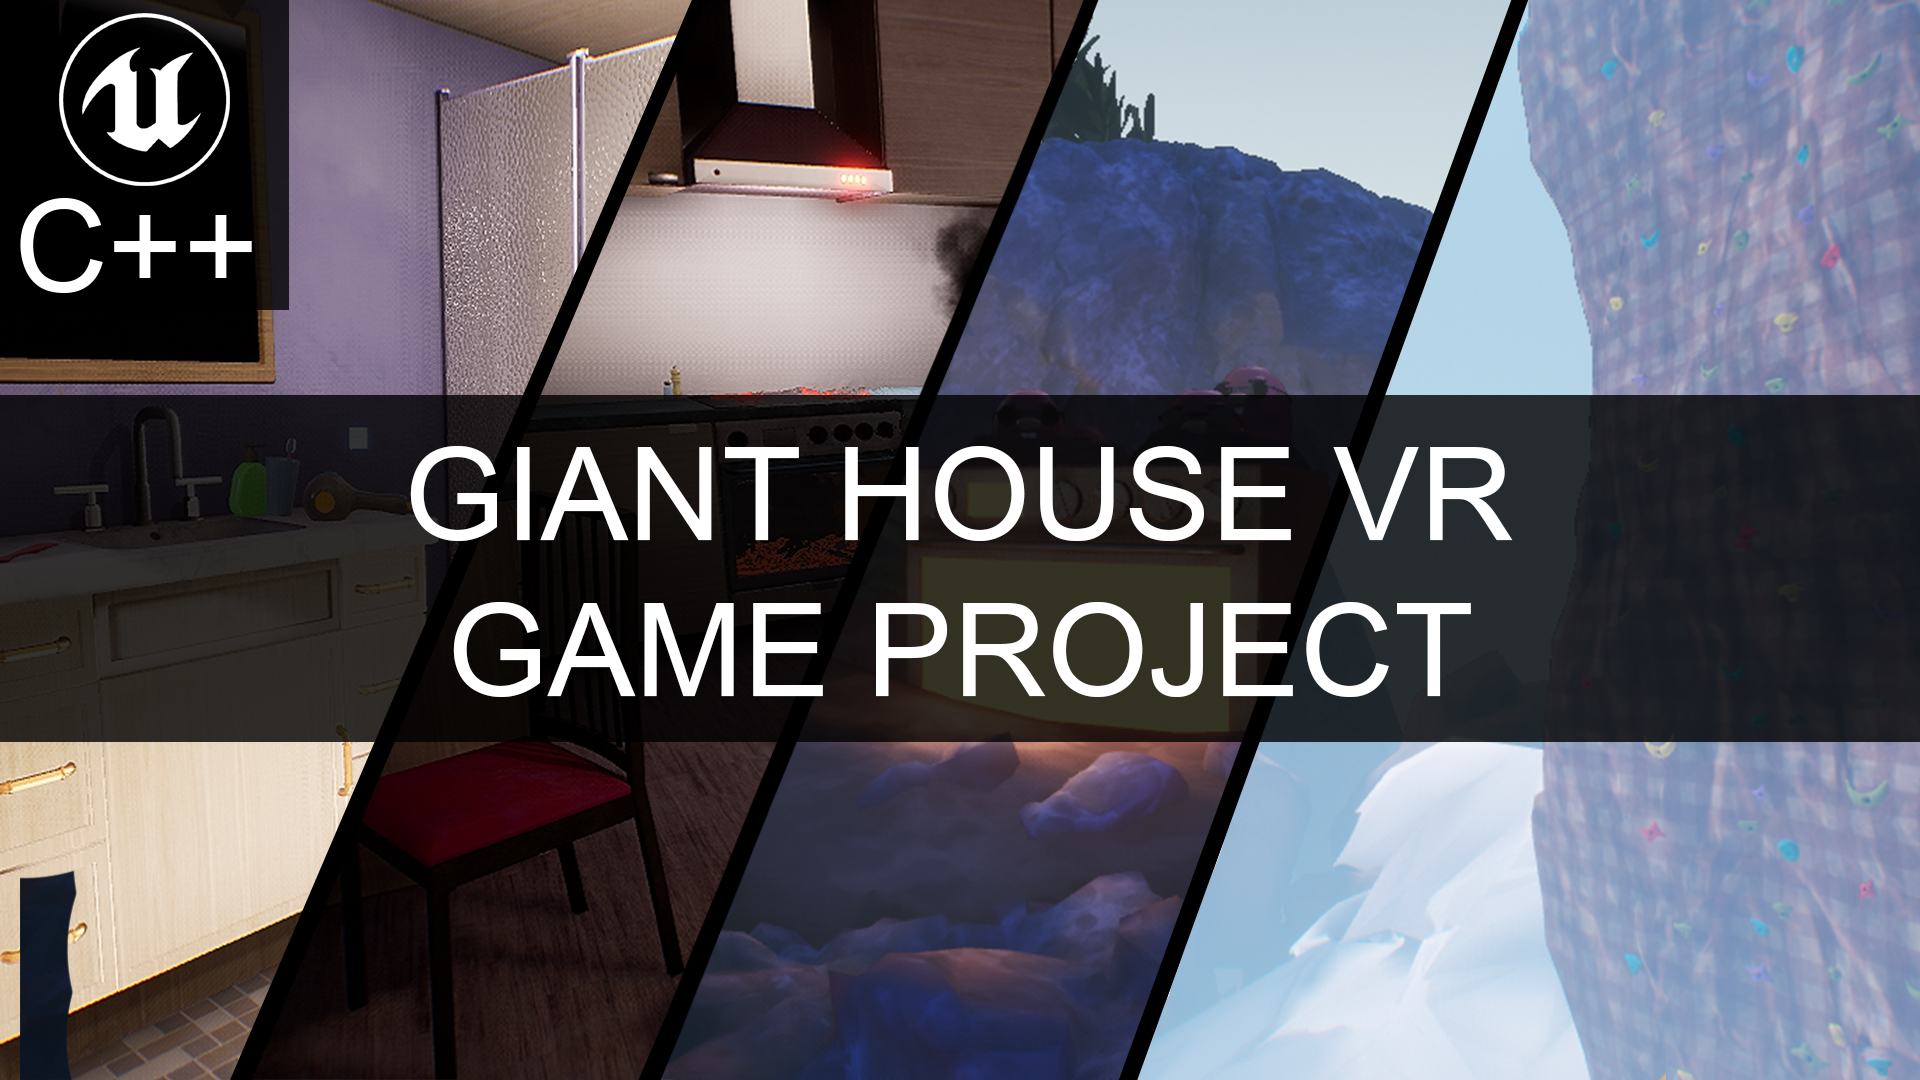 GiantHouse_HDThumbnailTemplate